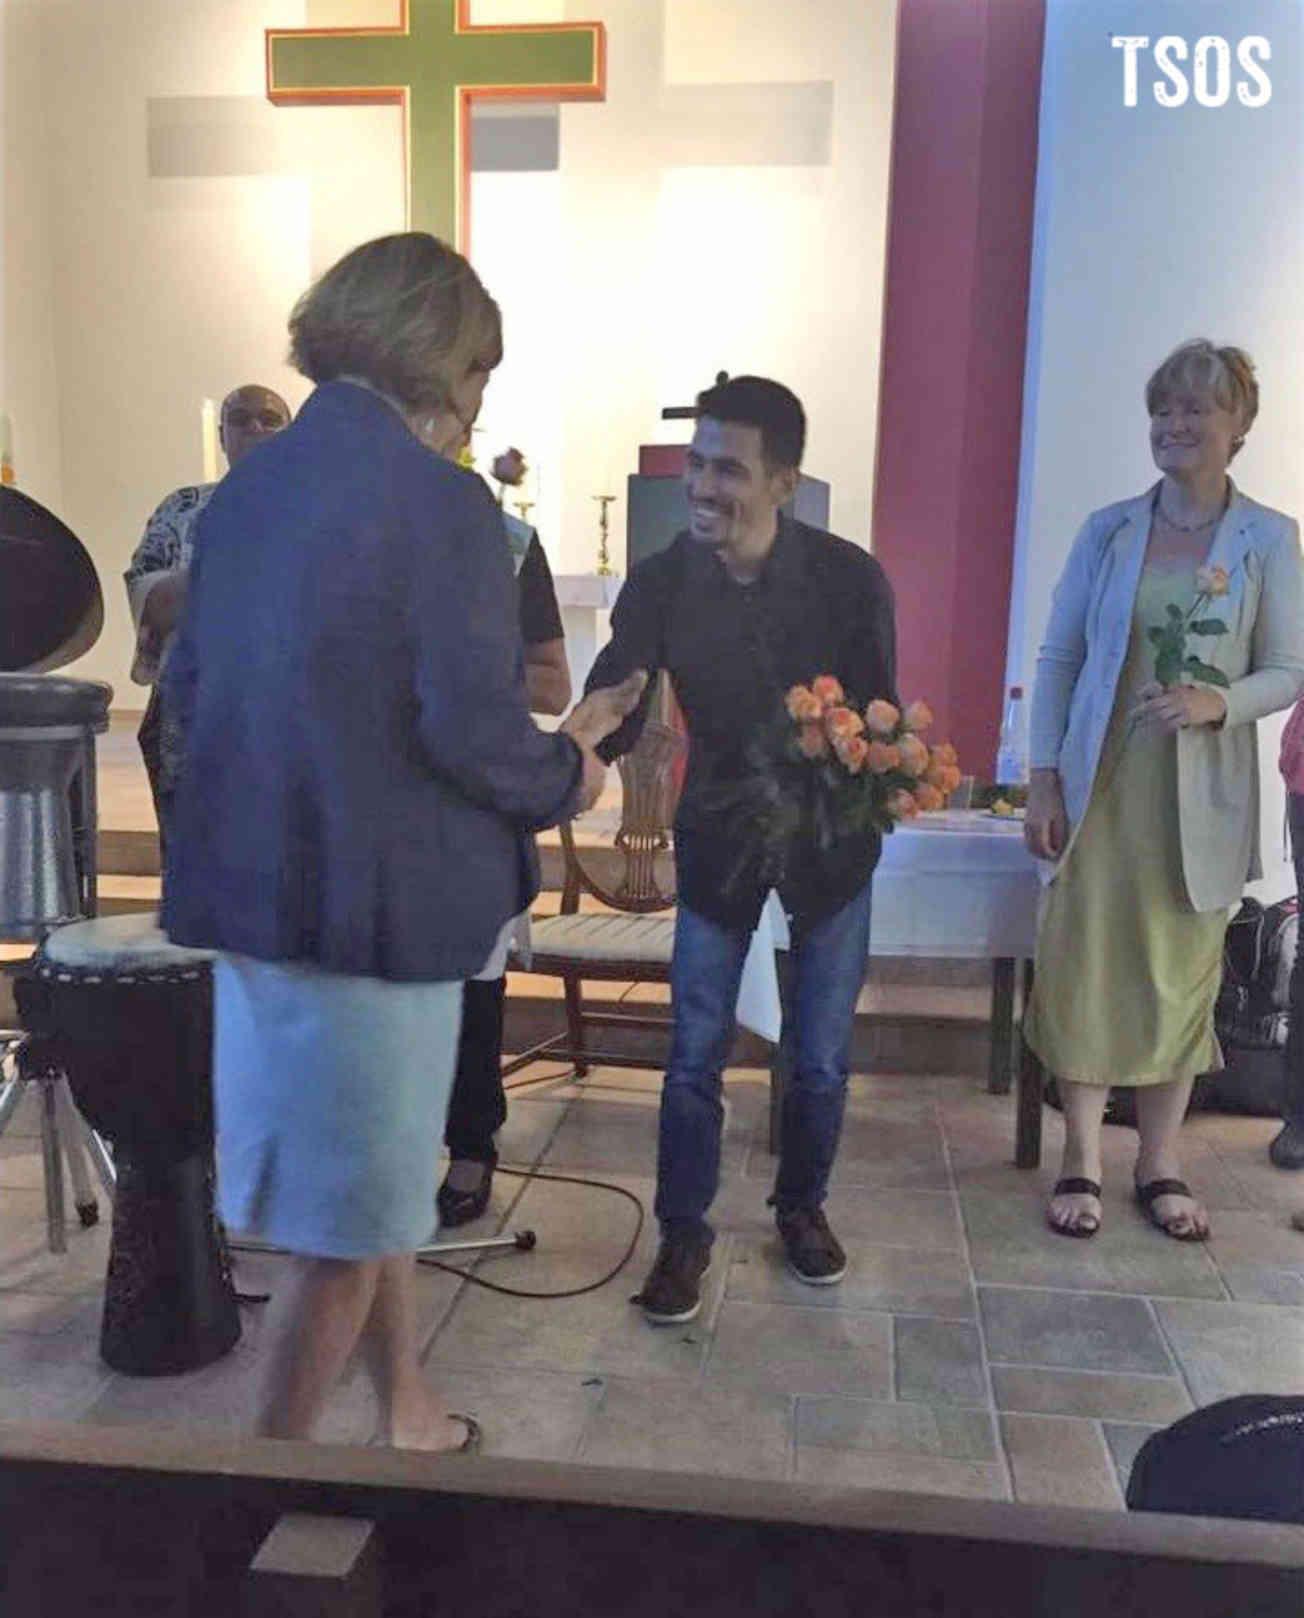 Aeham Giving Flowers